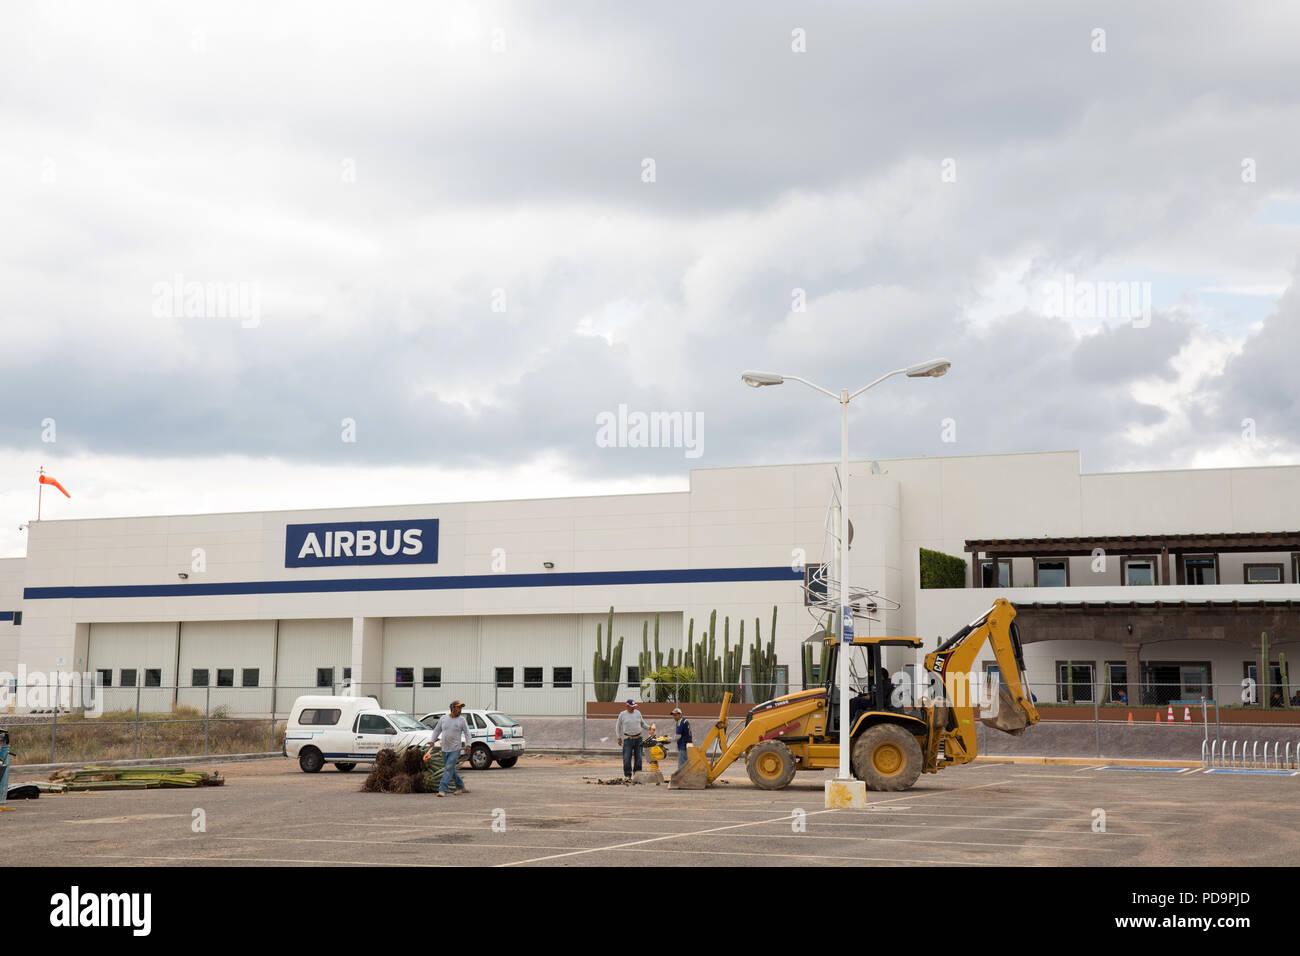 An Airbus SE plant in Querétaro, Querétaro state, Mexico on June 19, 2018. Photo credit by Bénédicte Desrus - Stock Image